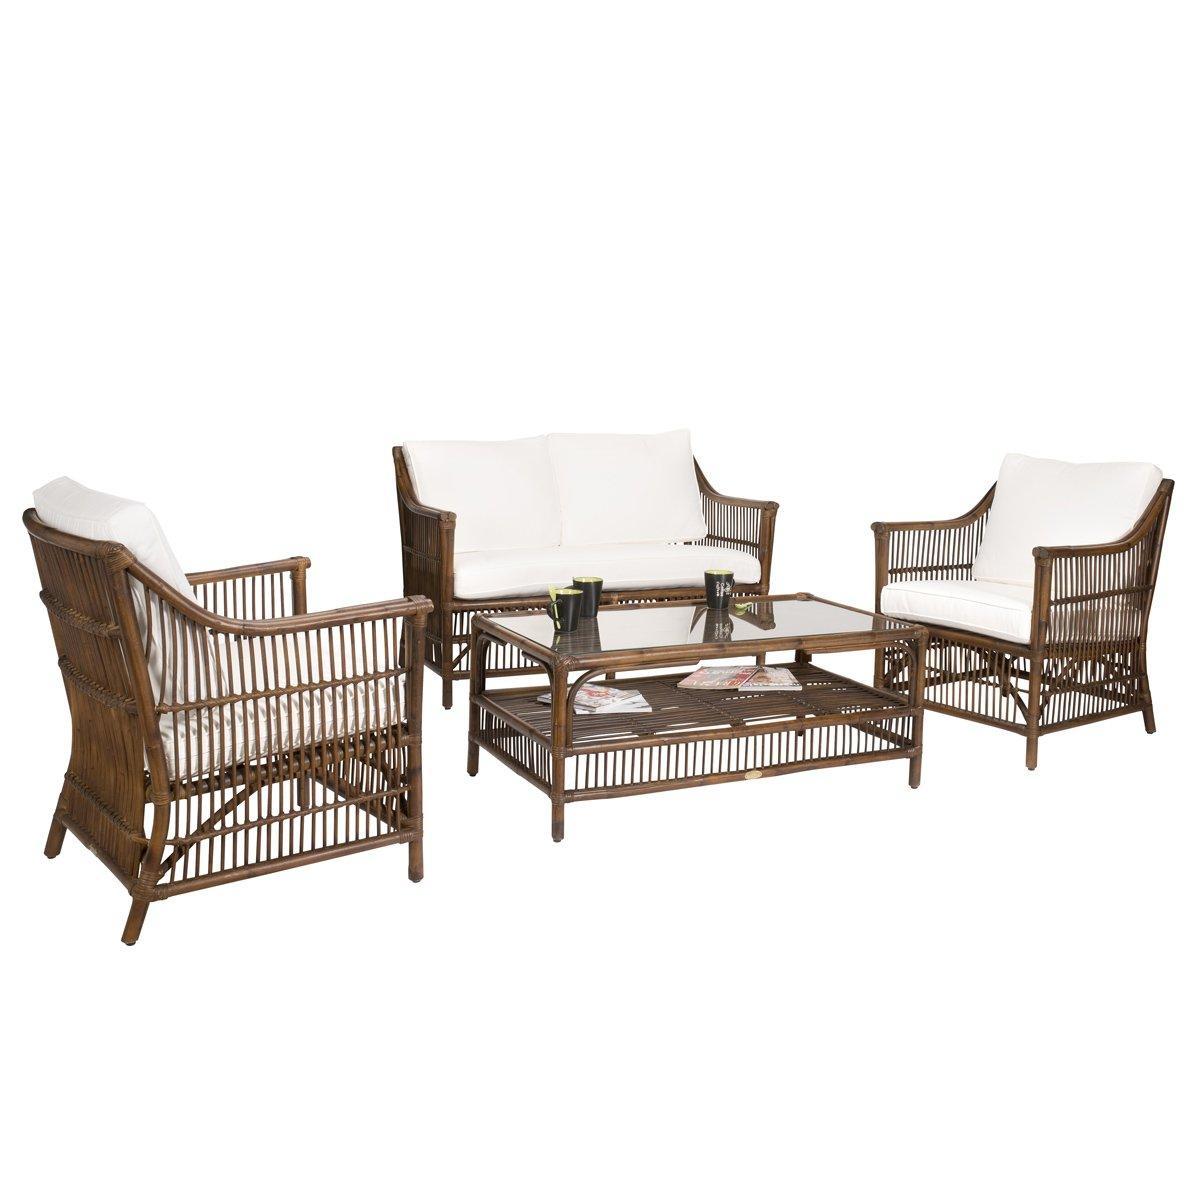 Rattan-Lounge Sitzgarnitur CHILI (Bambus) - 4-tlg. - inkl. Polsterauflagen - Braun